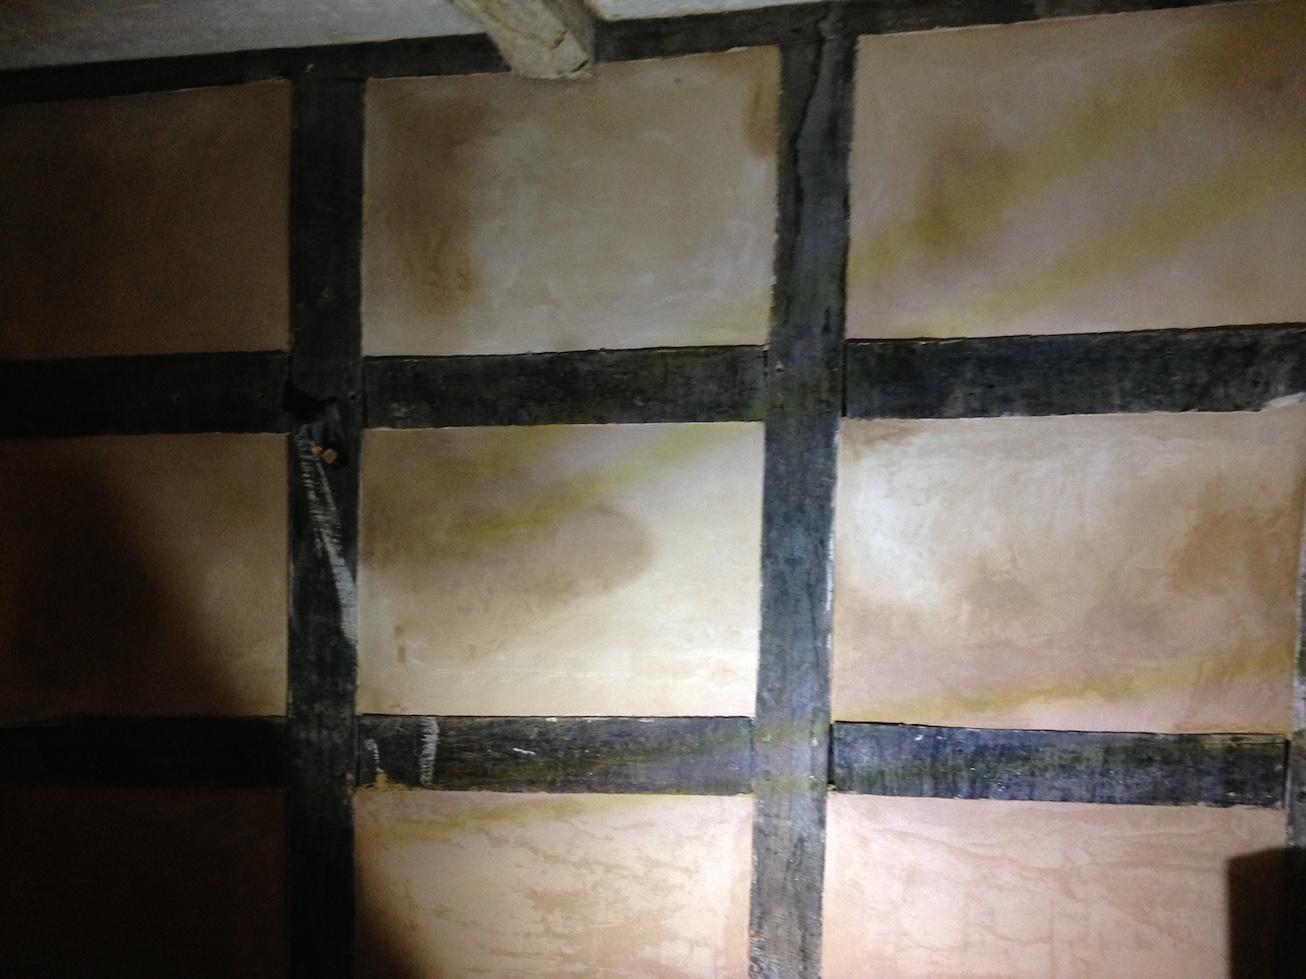 Repairing the old 17th Century plastering